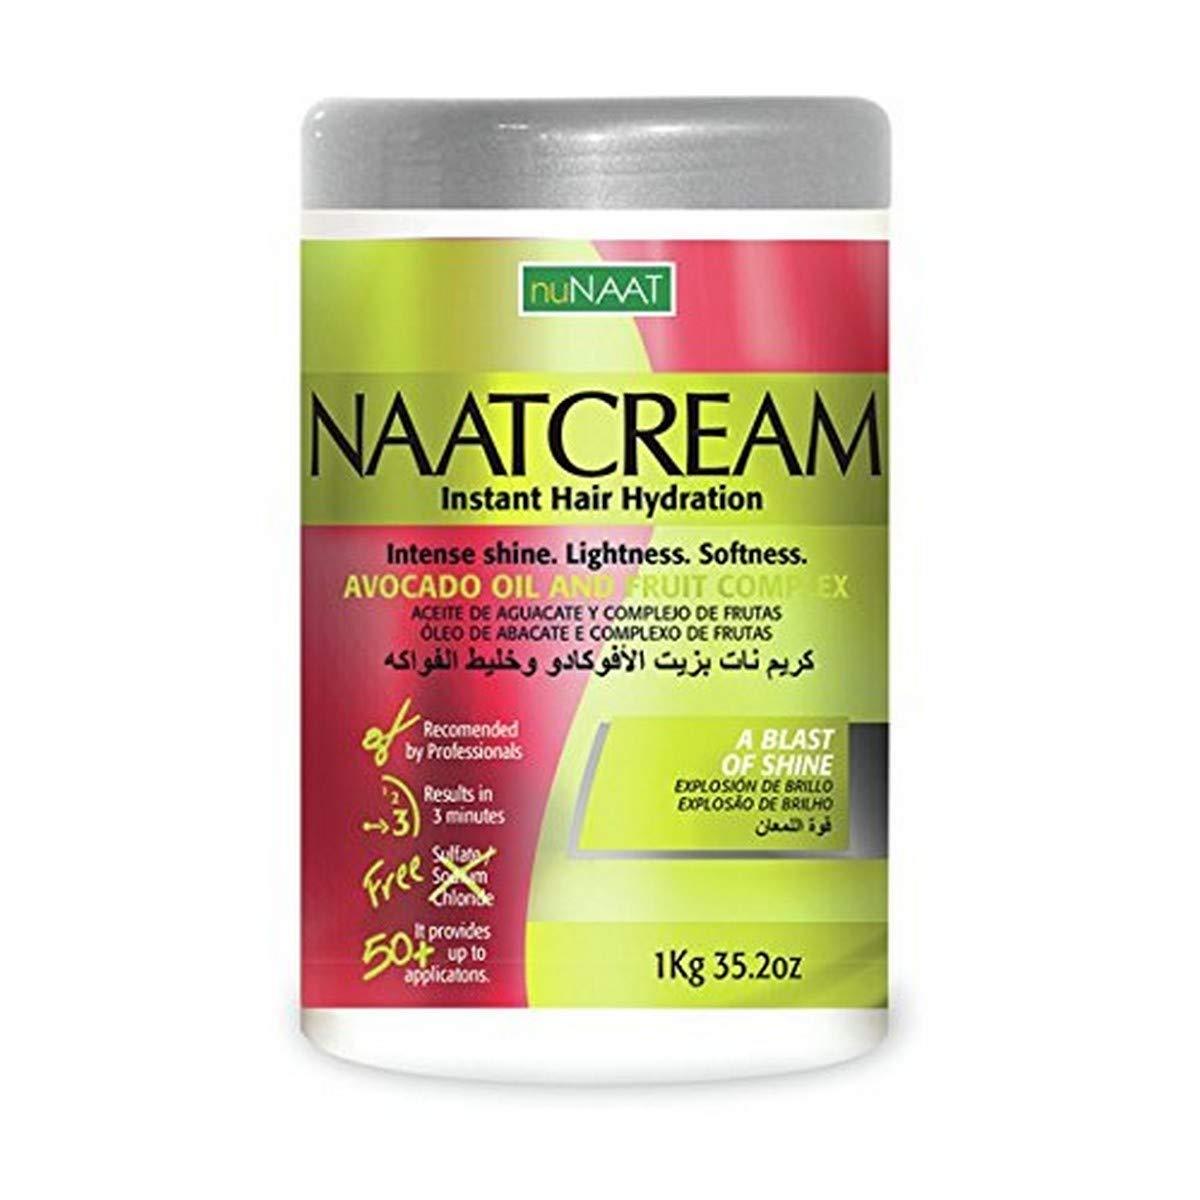 Nunaat Naat Avocado Oil Hair Cream and Fruit Complex, 35.2 Ounce